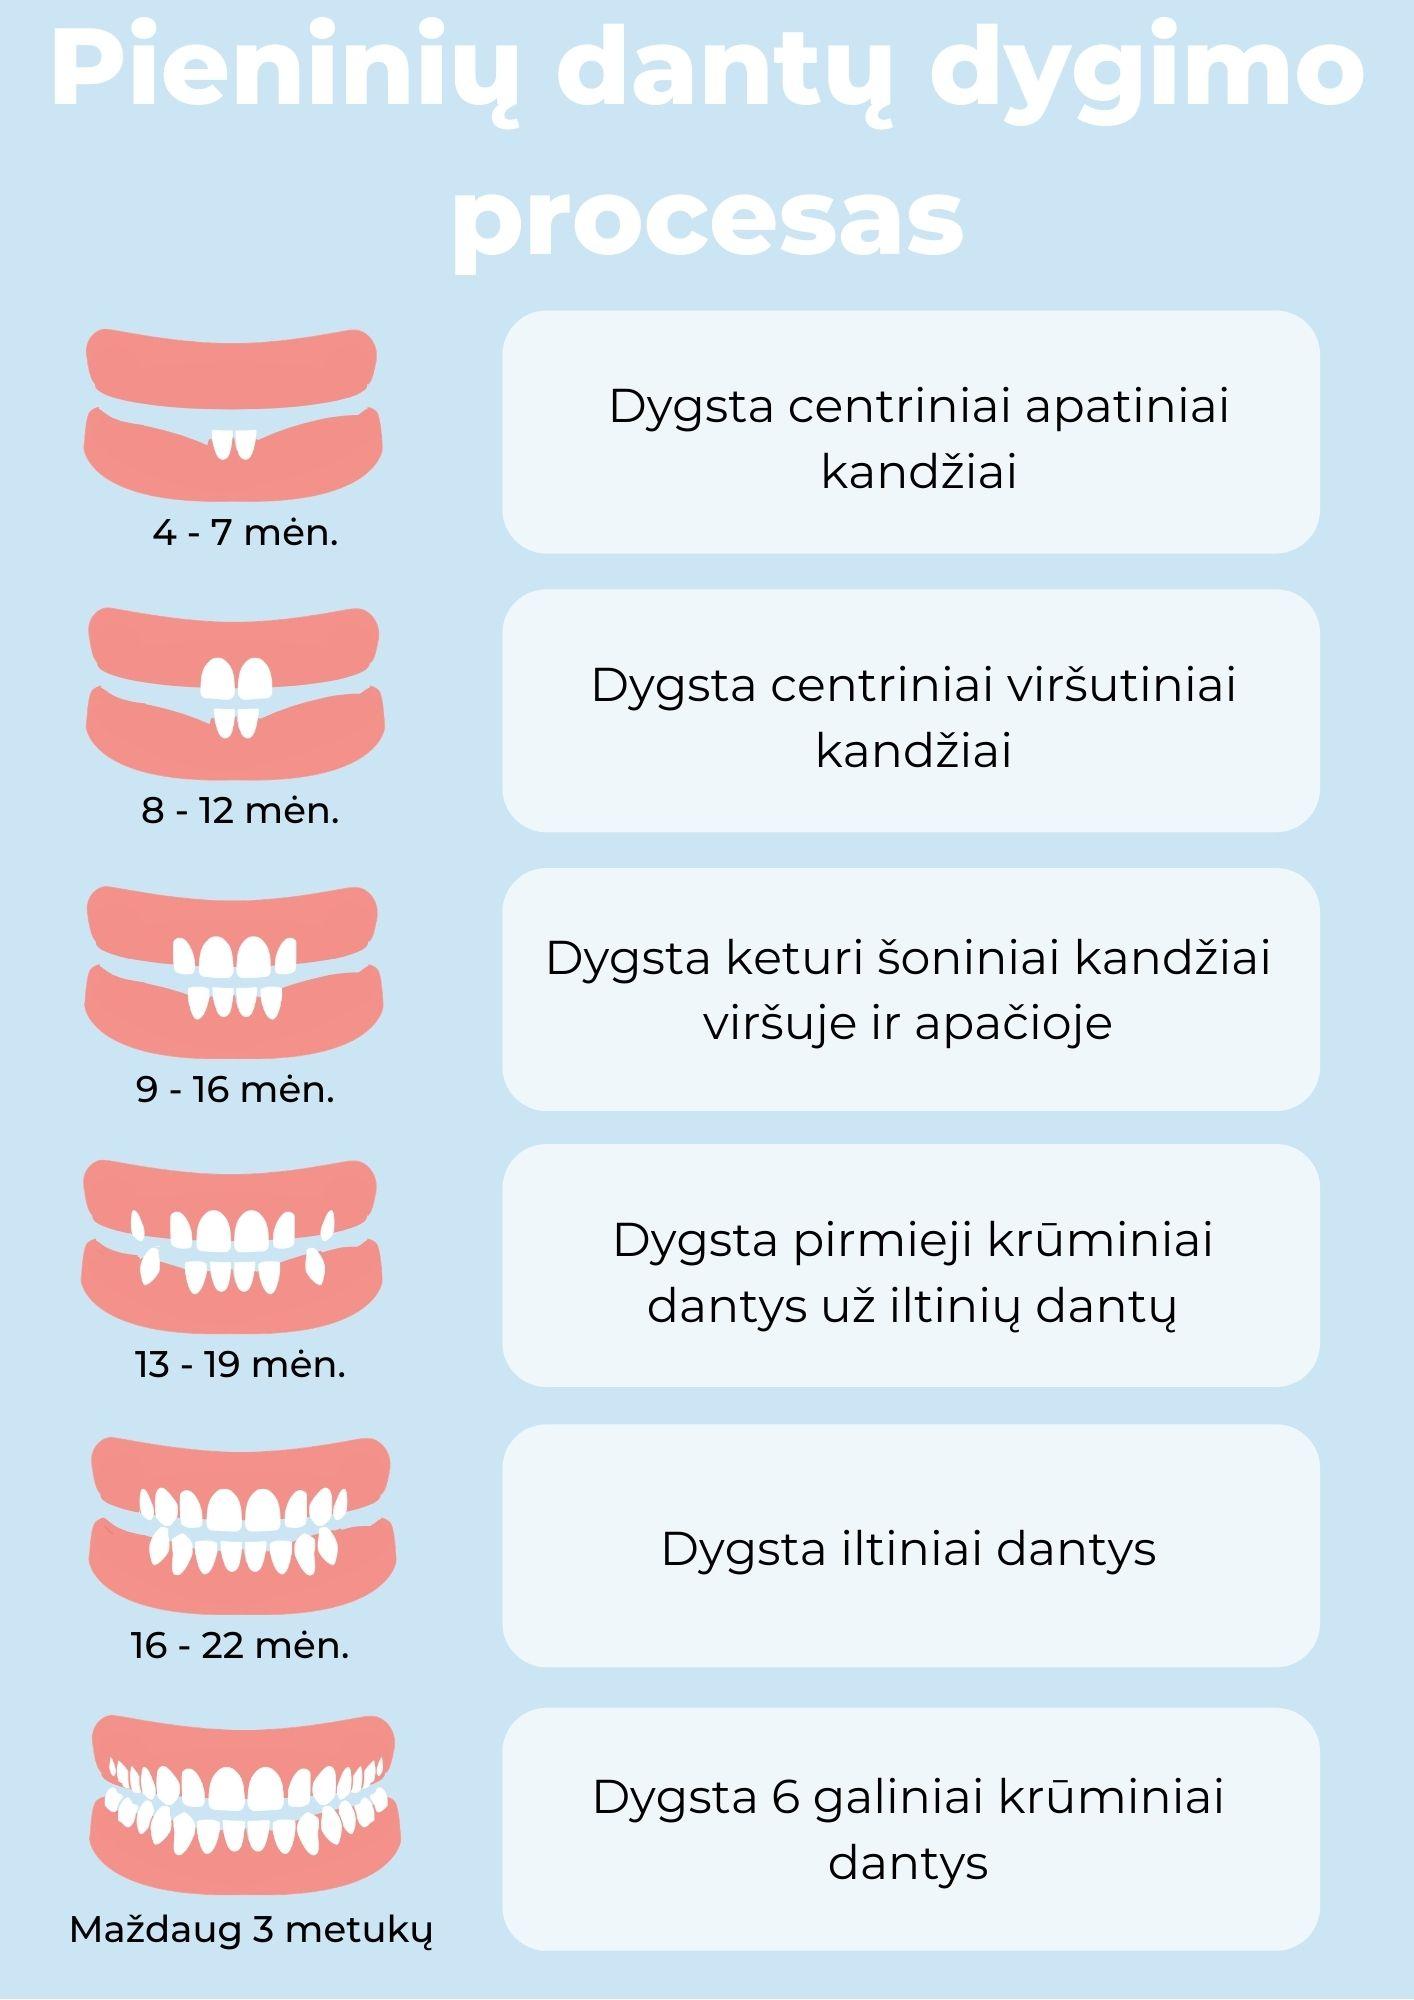 kada išdygsta pirmieji dantys?